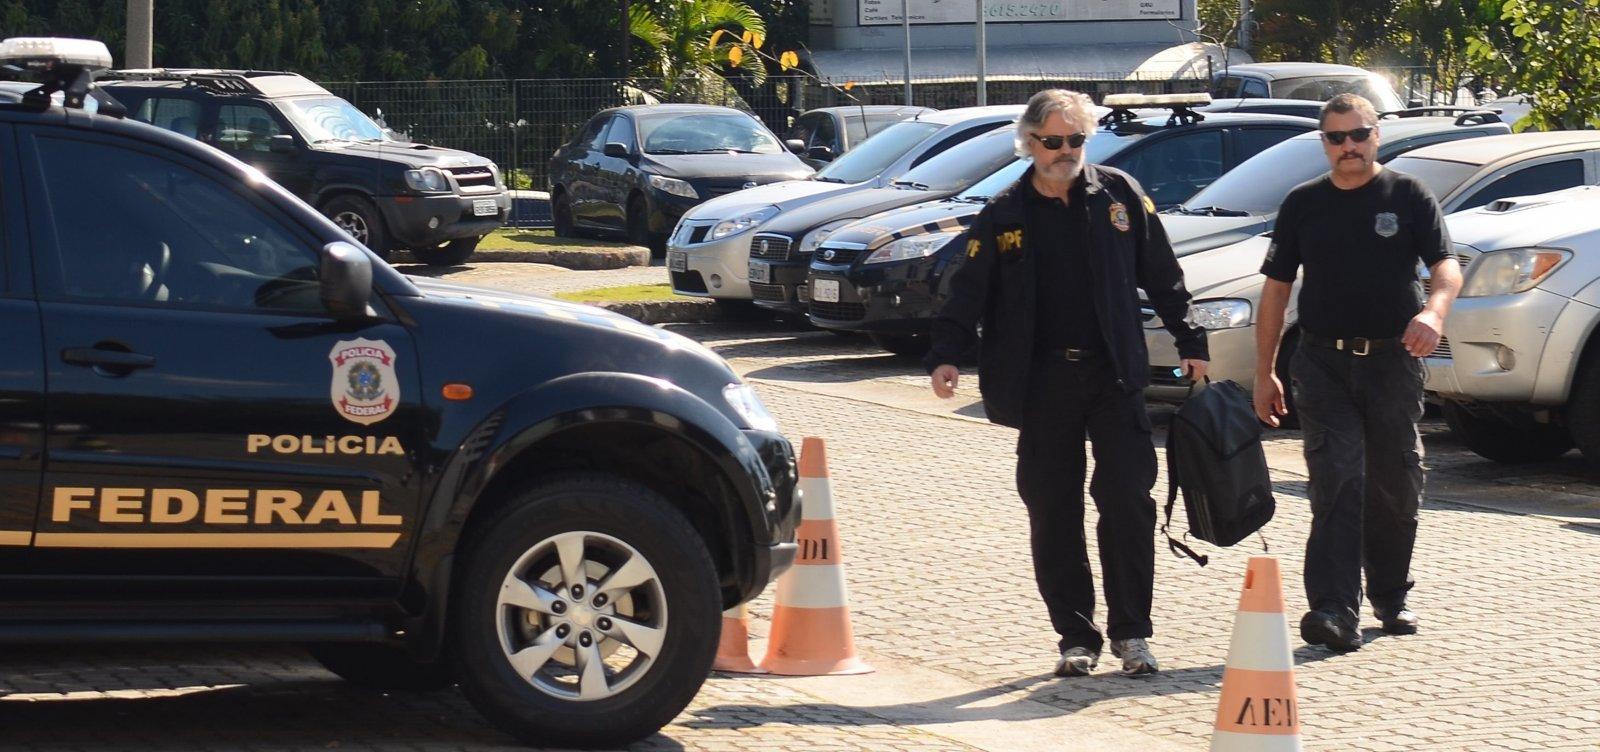 Polícia Federal deflagra 76ª fase da Operação Lava Jato